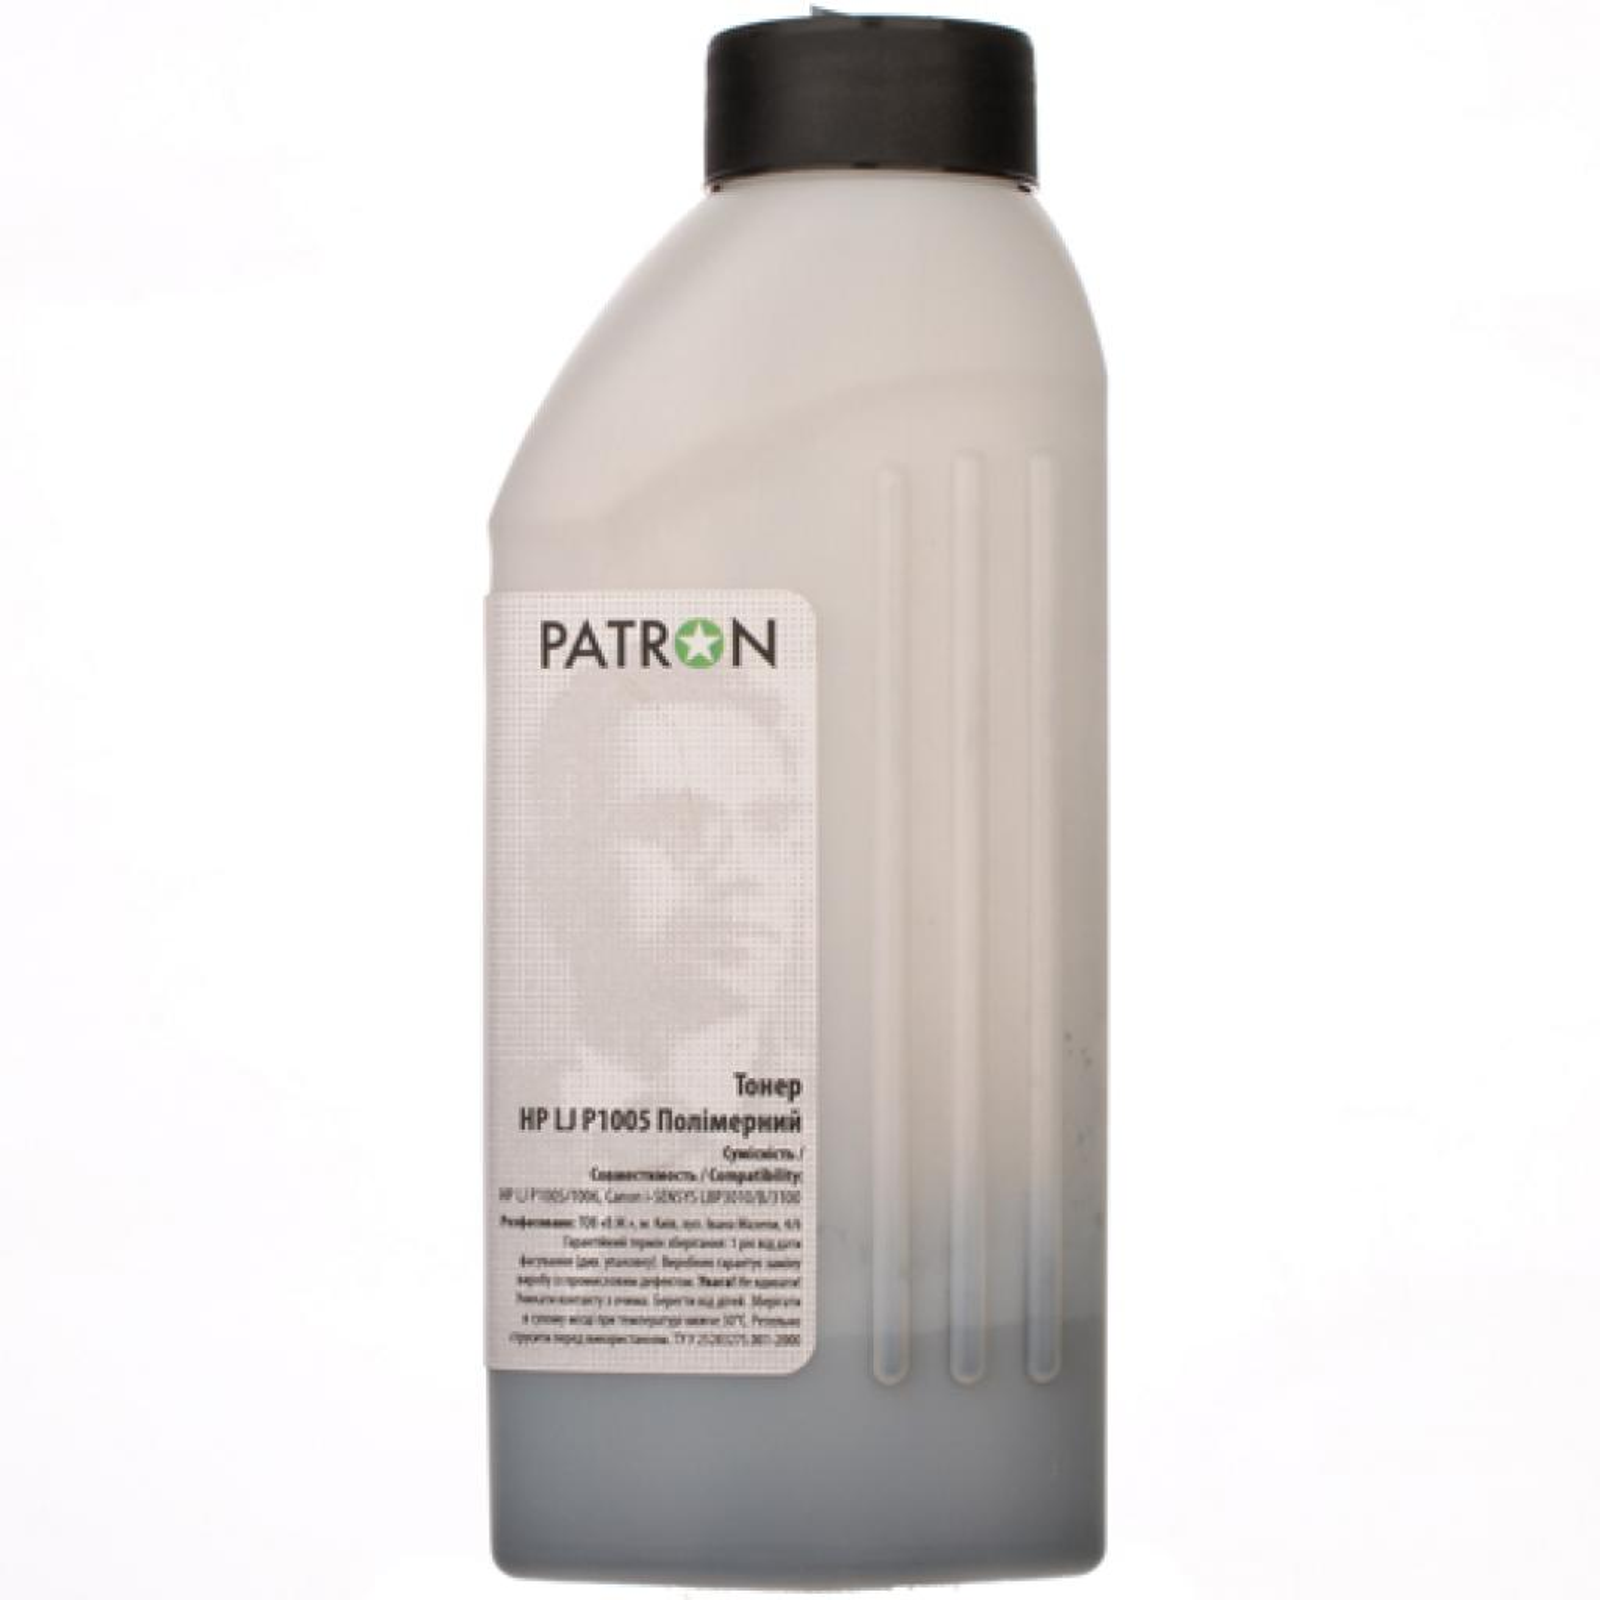 Тонер PATRON HP LJ P1005 Polymer 85г (PN-HLJP1005-P-085) изображение 2